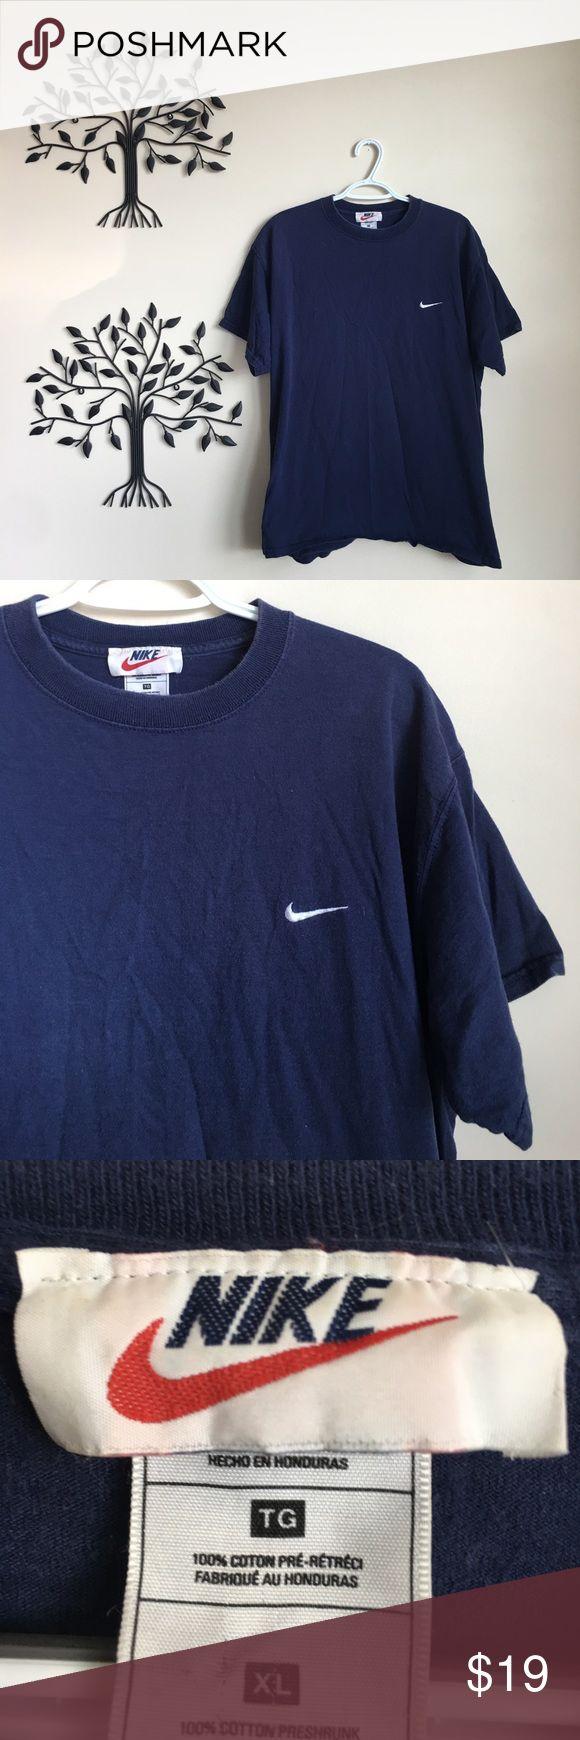 Vintage Nike Swoosh Orange Swoosh T Shirt Navy Vintage